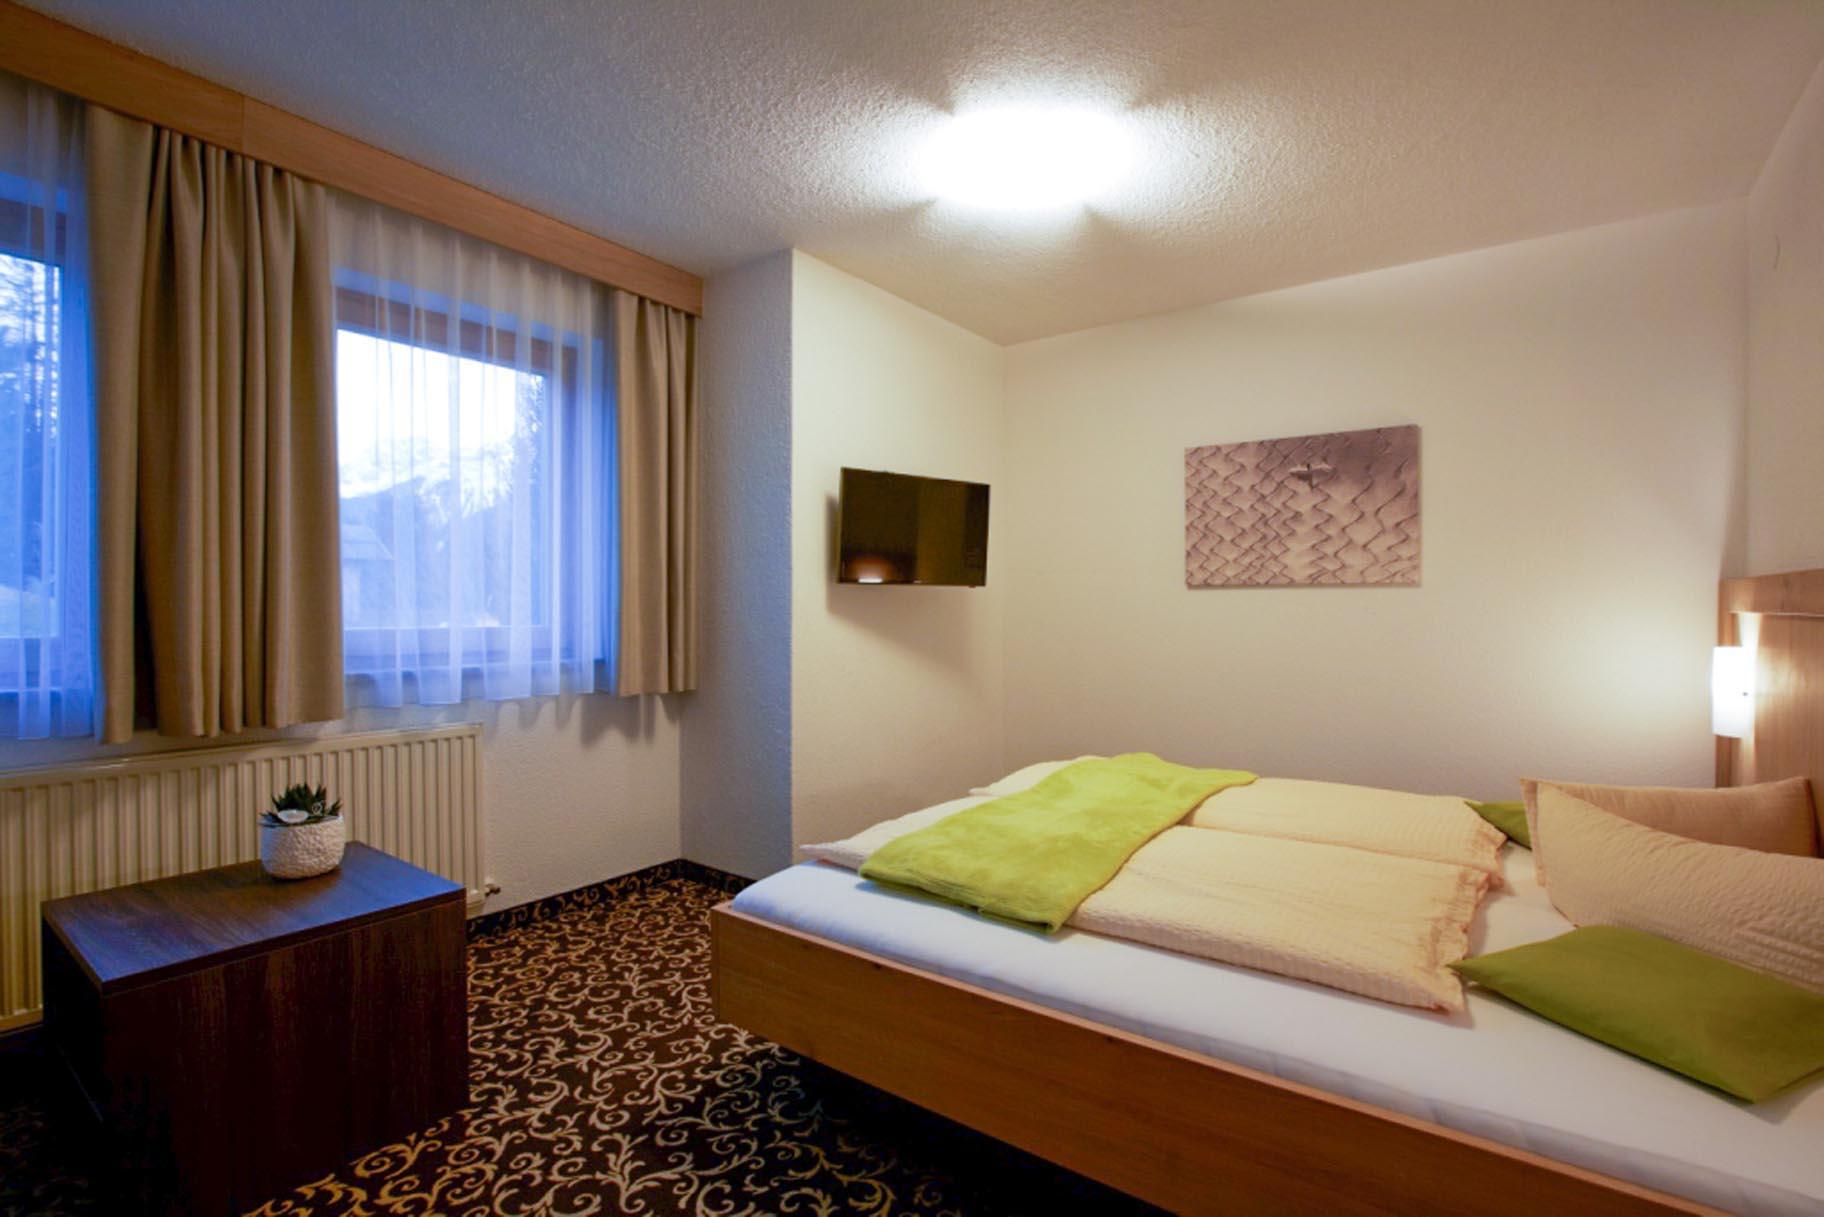 Apartment 3, bedroom